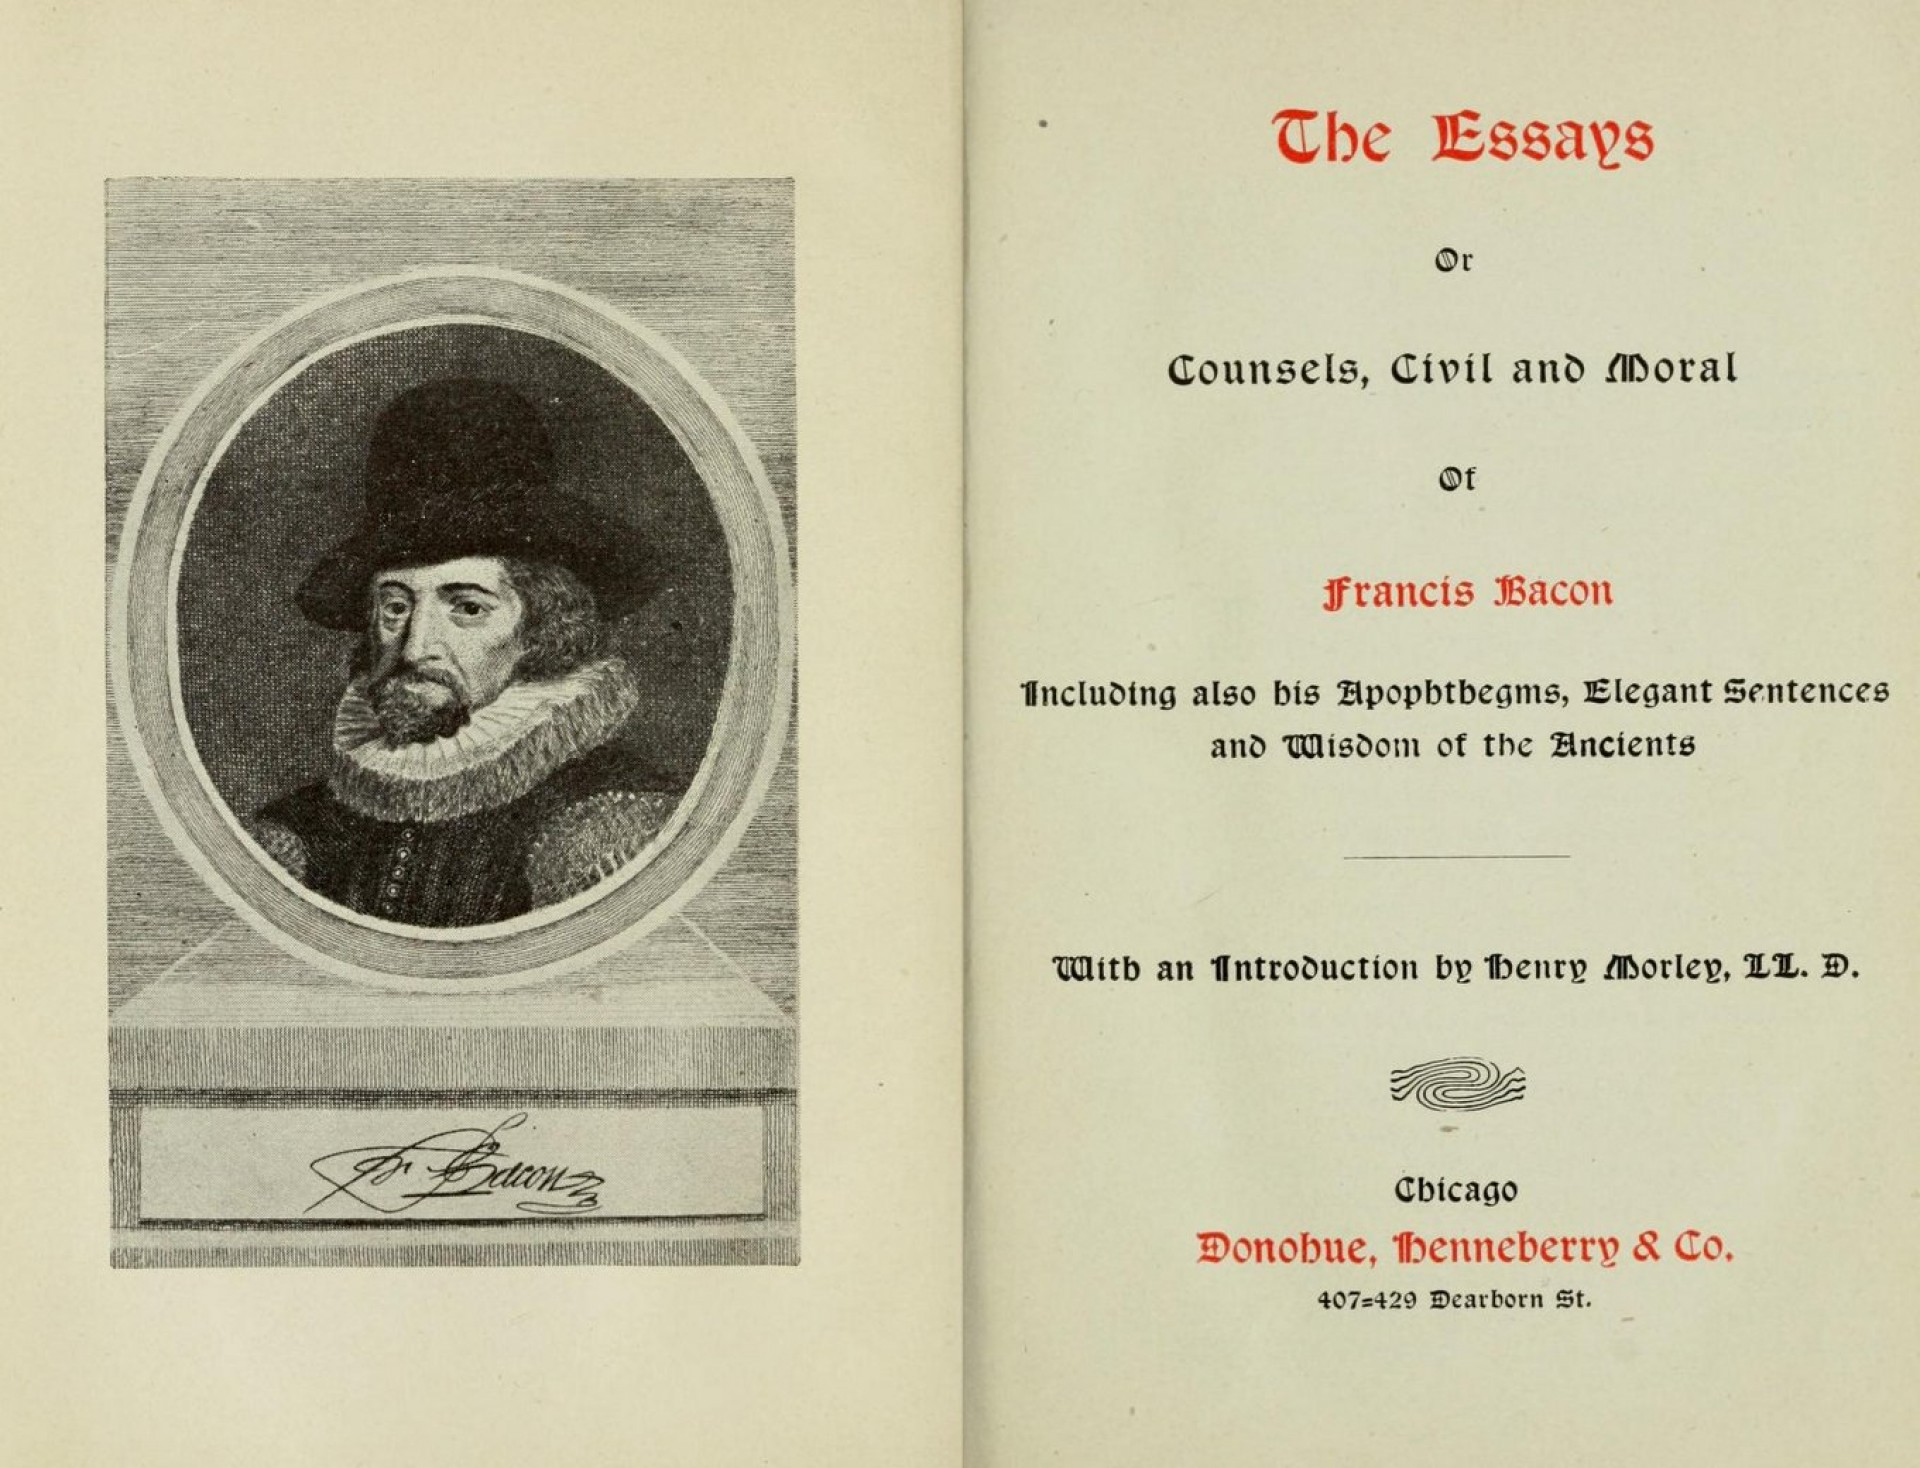 014 Essay Example Francis Bacon The Essays Amazing Bacons Google Books Of Truth Quiz Bacon's Summary 1920